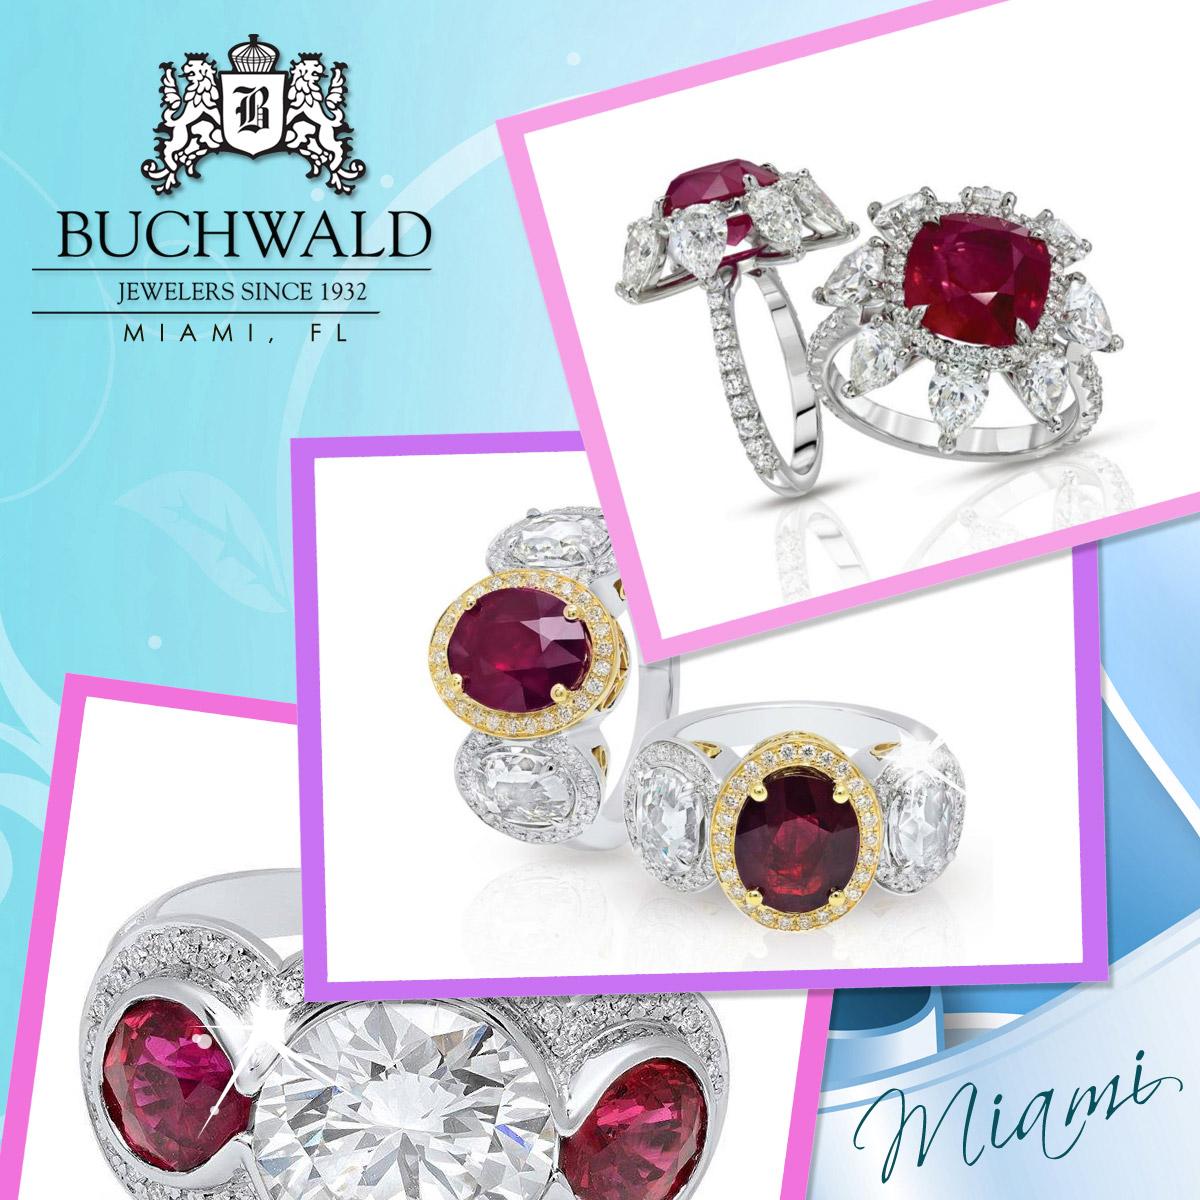 Rubies, Rubies and more Rubies! Timeless Jewelry Pieces at @BuchwaldJeweler https://www.buchwaldjewelers.com  #Rubies #Ruby #RubyDiamond #RubyJewelry #MiamiJewelryStore #MiamiJeweler #BuchwaldJewelers #SeyboldBuildingpic.twitter.com/rryk9uGVIi